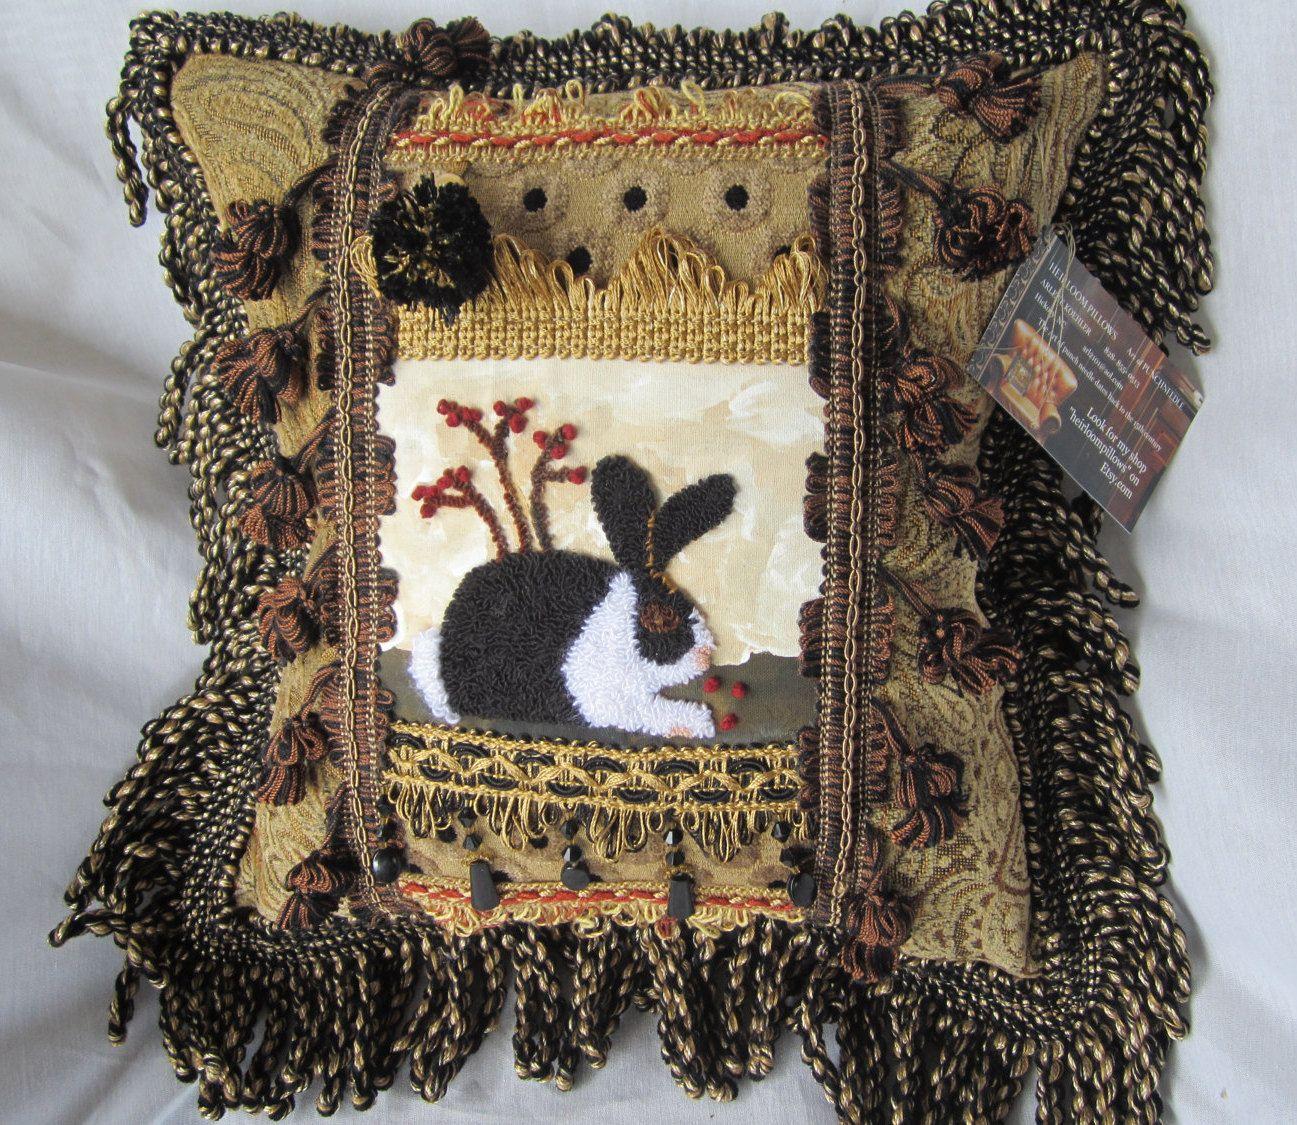 Black and white bunny designer american handmade decorative accent